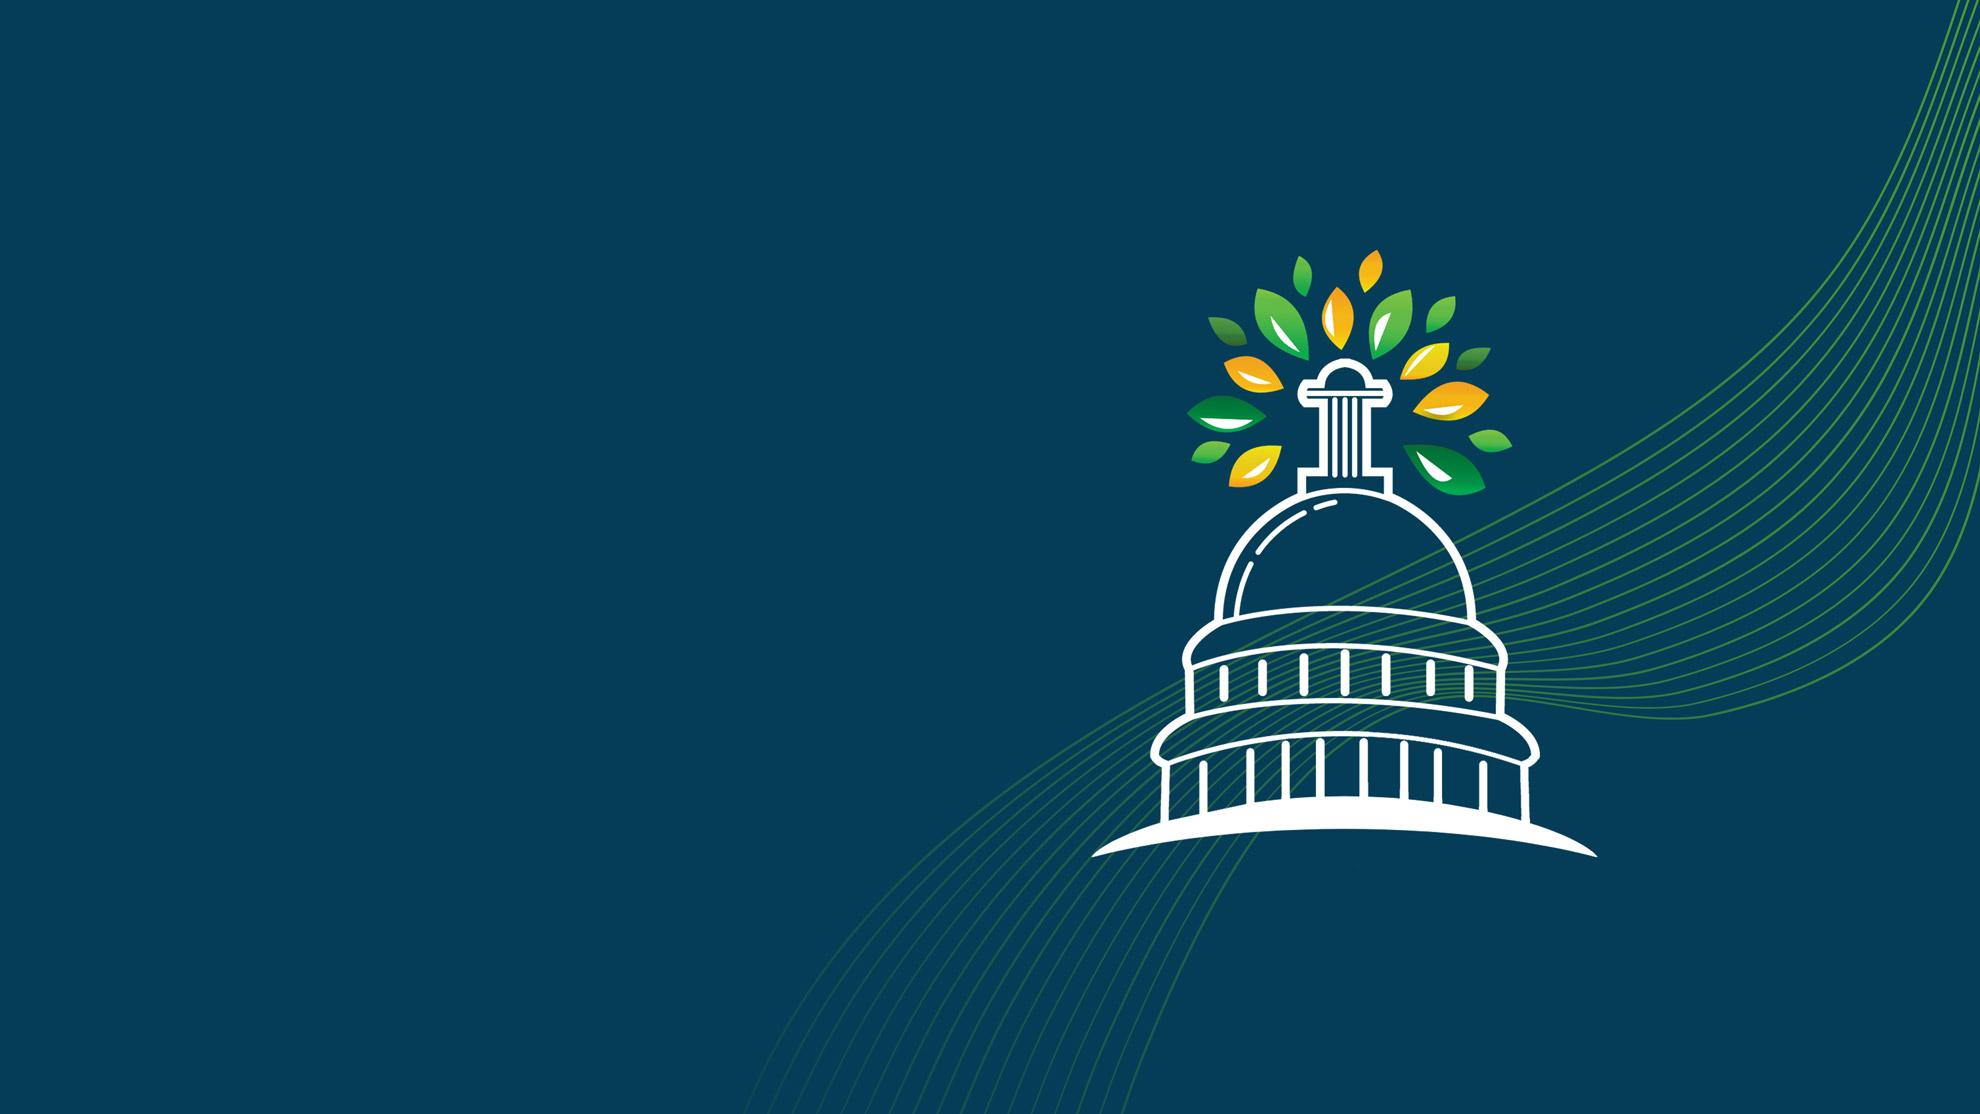 Policy-Summit-Banner-Background-(24)